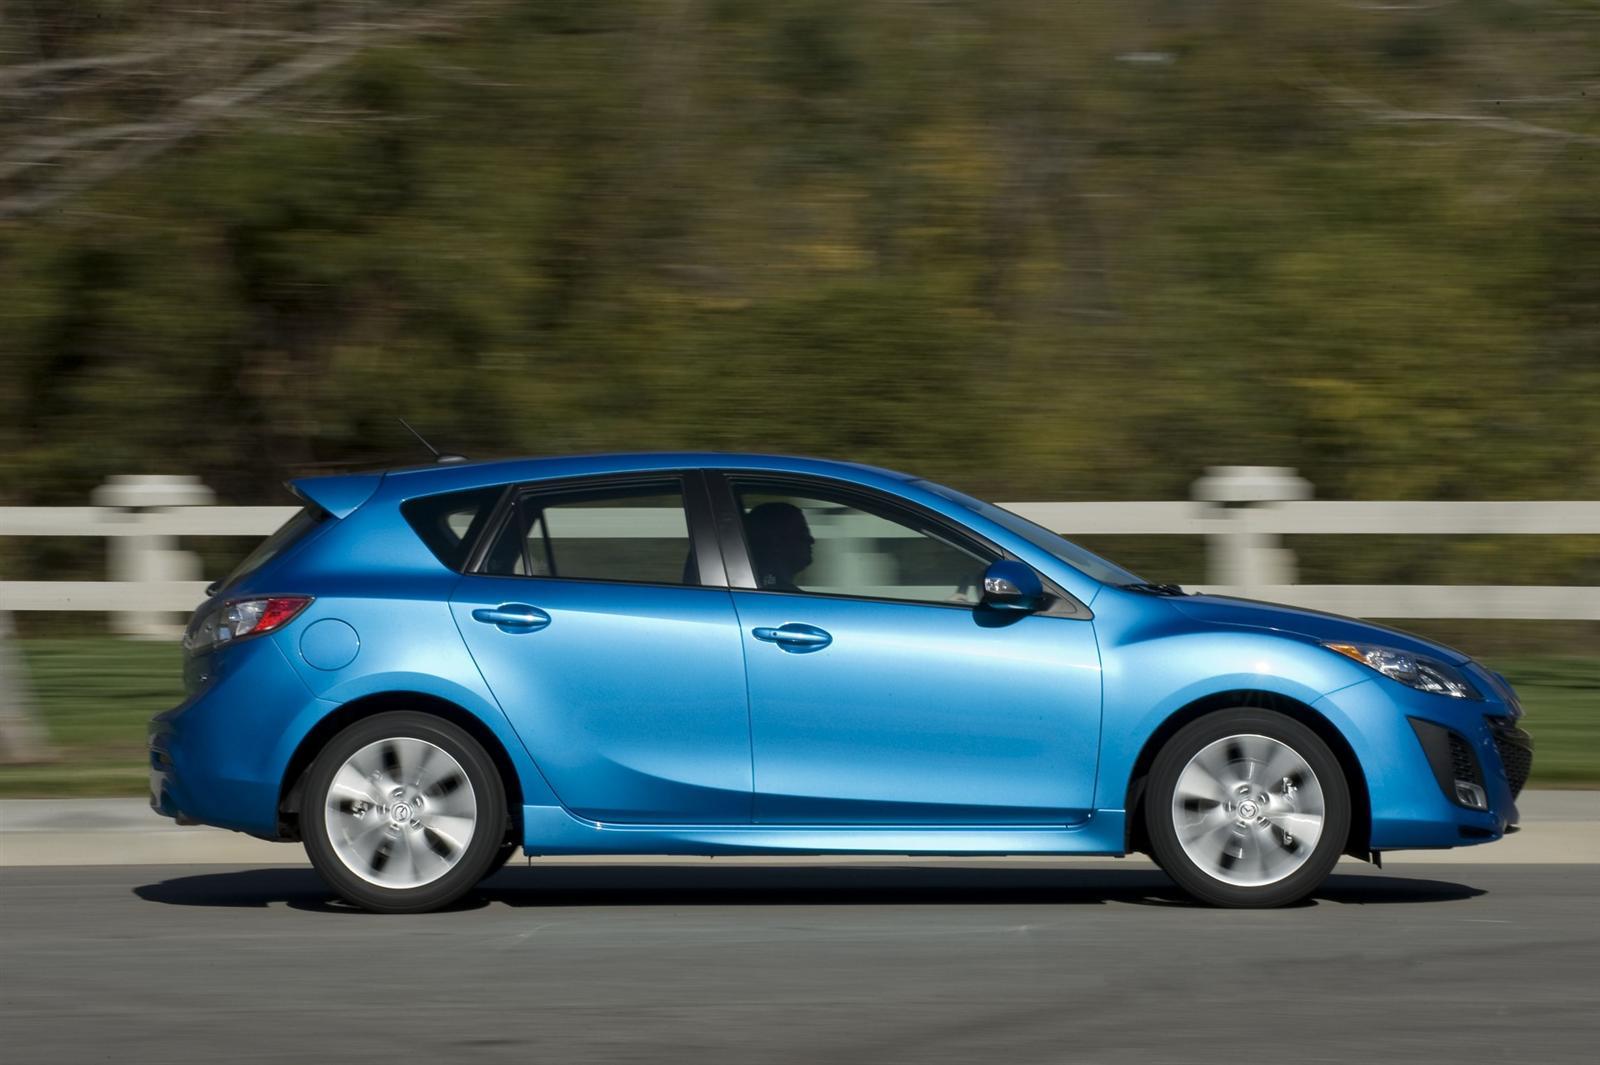 Price Of Mazda 5 >> 2010 Mazda 3 5-Door Image. Photo 29 of 32